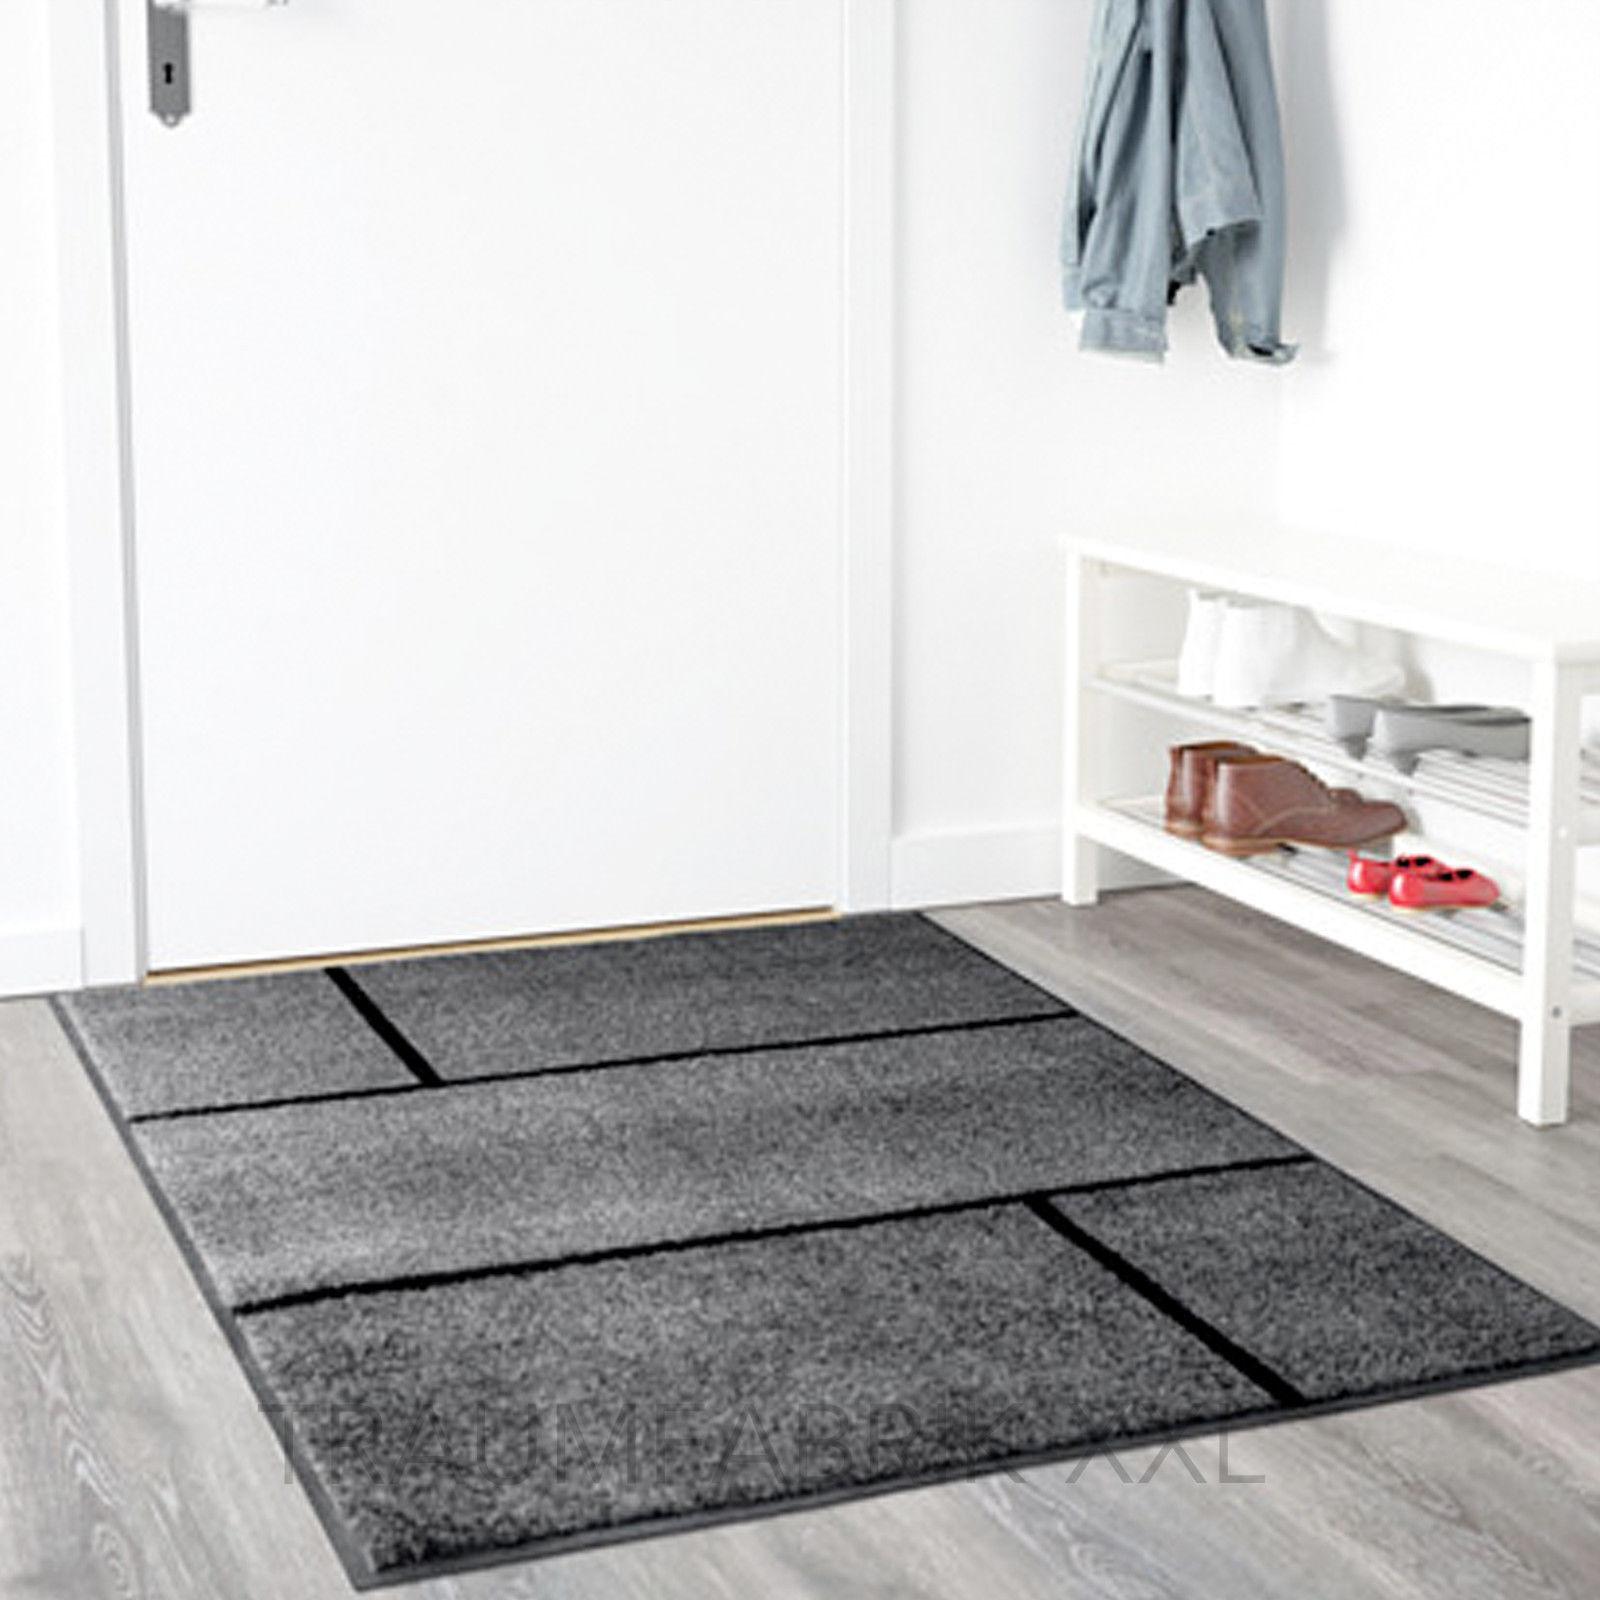 ikea k ge fu matte 102 152 cm grau schwarz bodenmatte fu abtreter t rmatte neu traumfabrik xxl. Black Bedroom Furniture Sets. Home Design Ideas